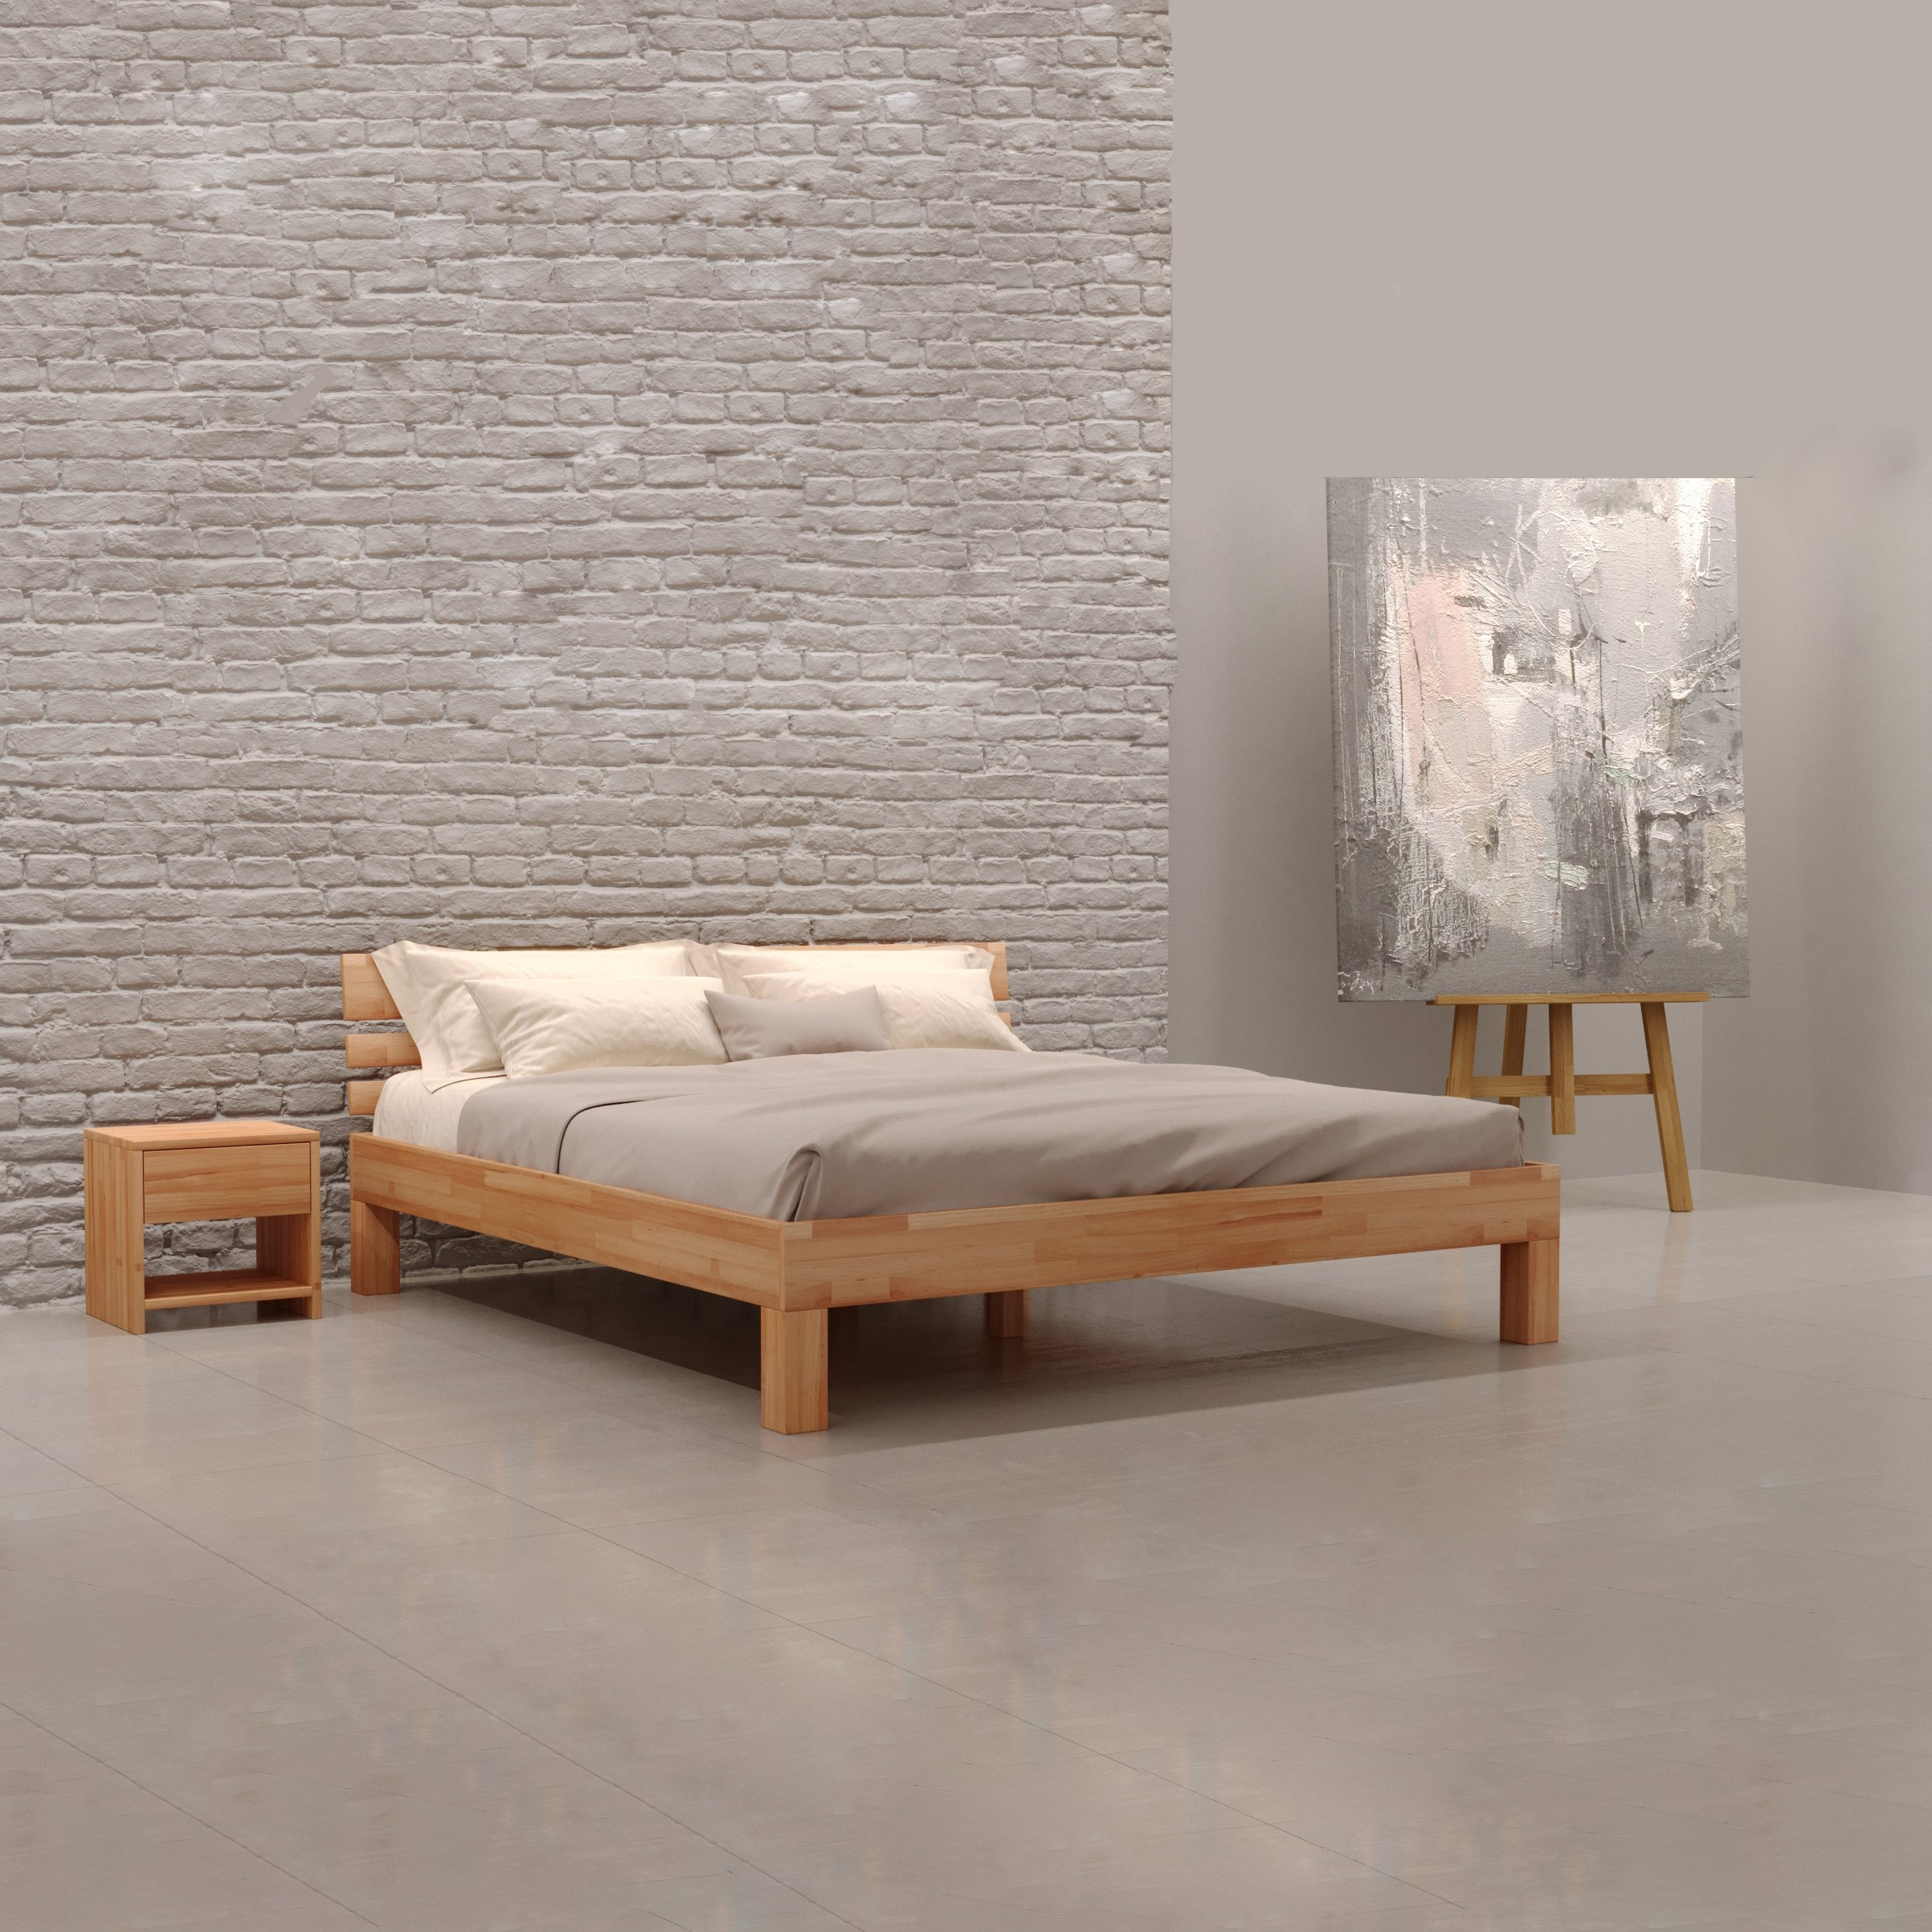 Am besten bewertete Produkte in der Kategorie Holzbetten - Amazon.de